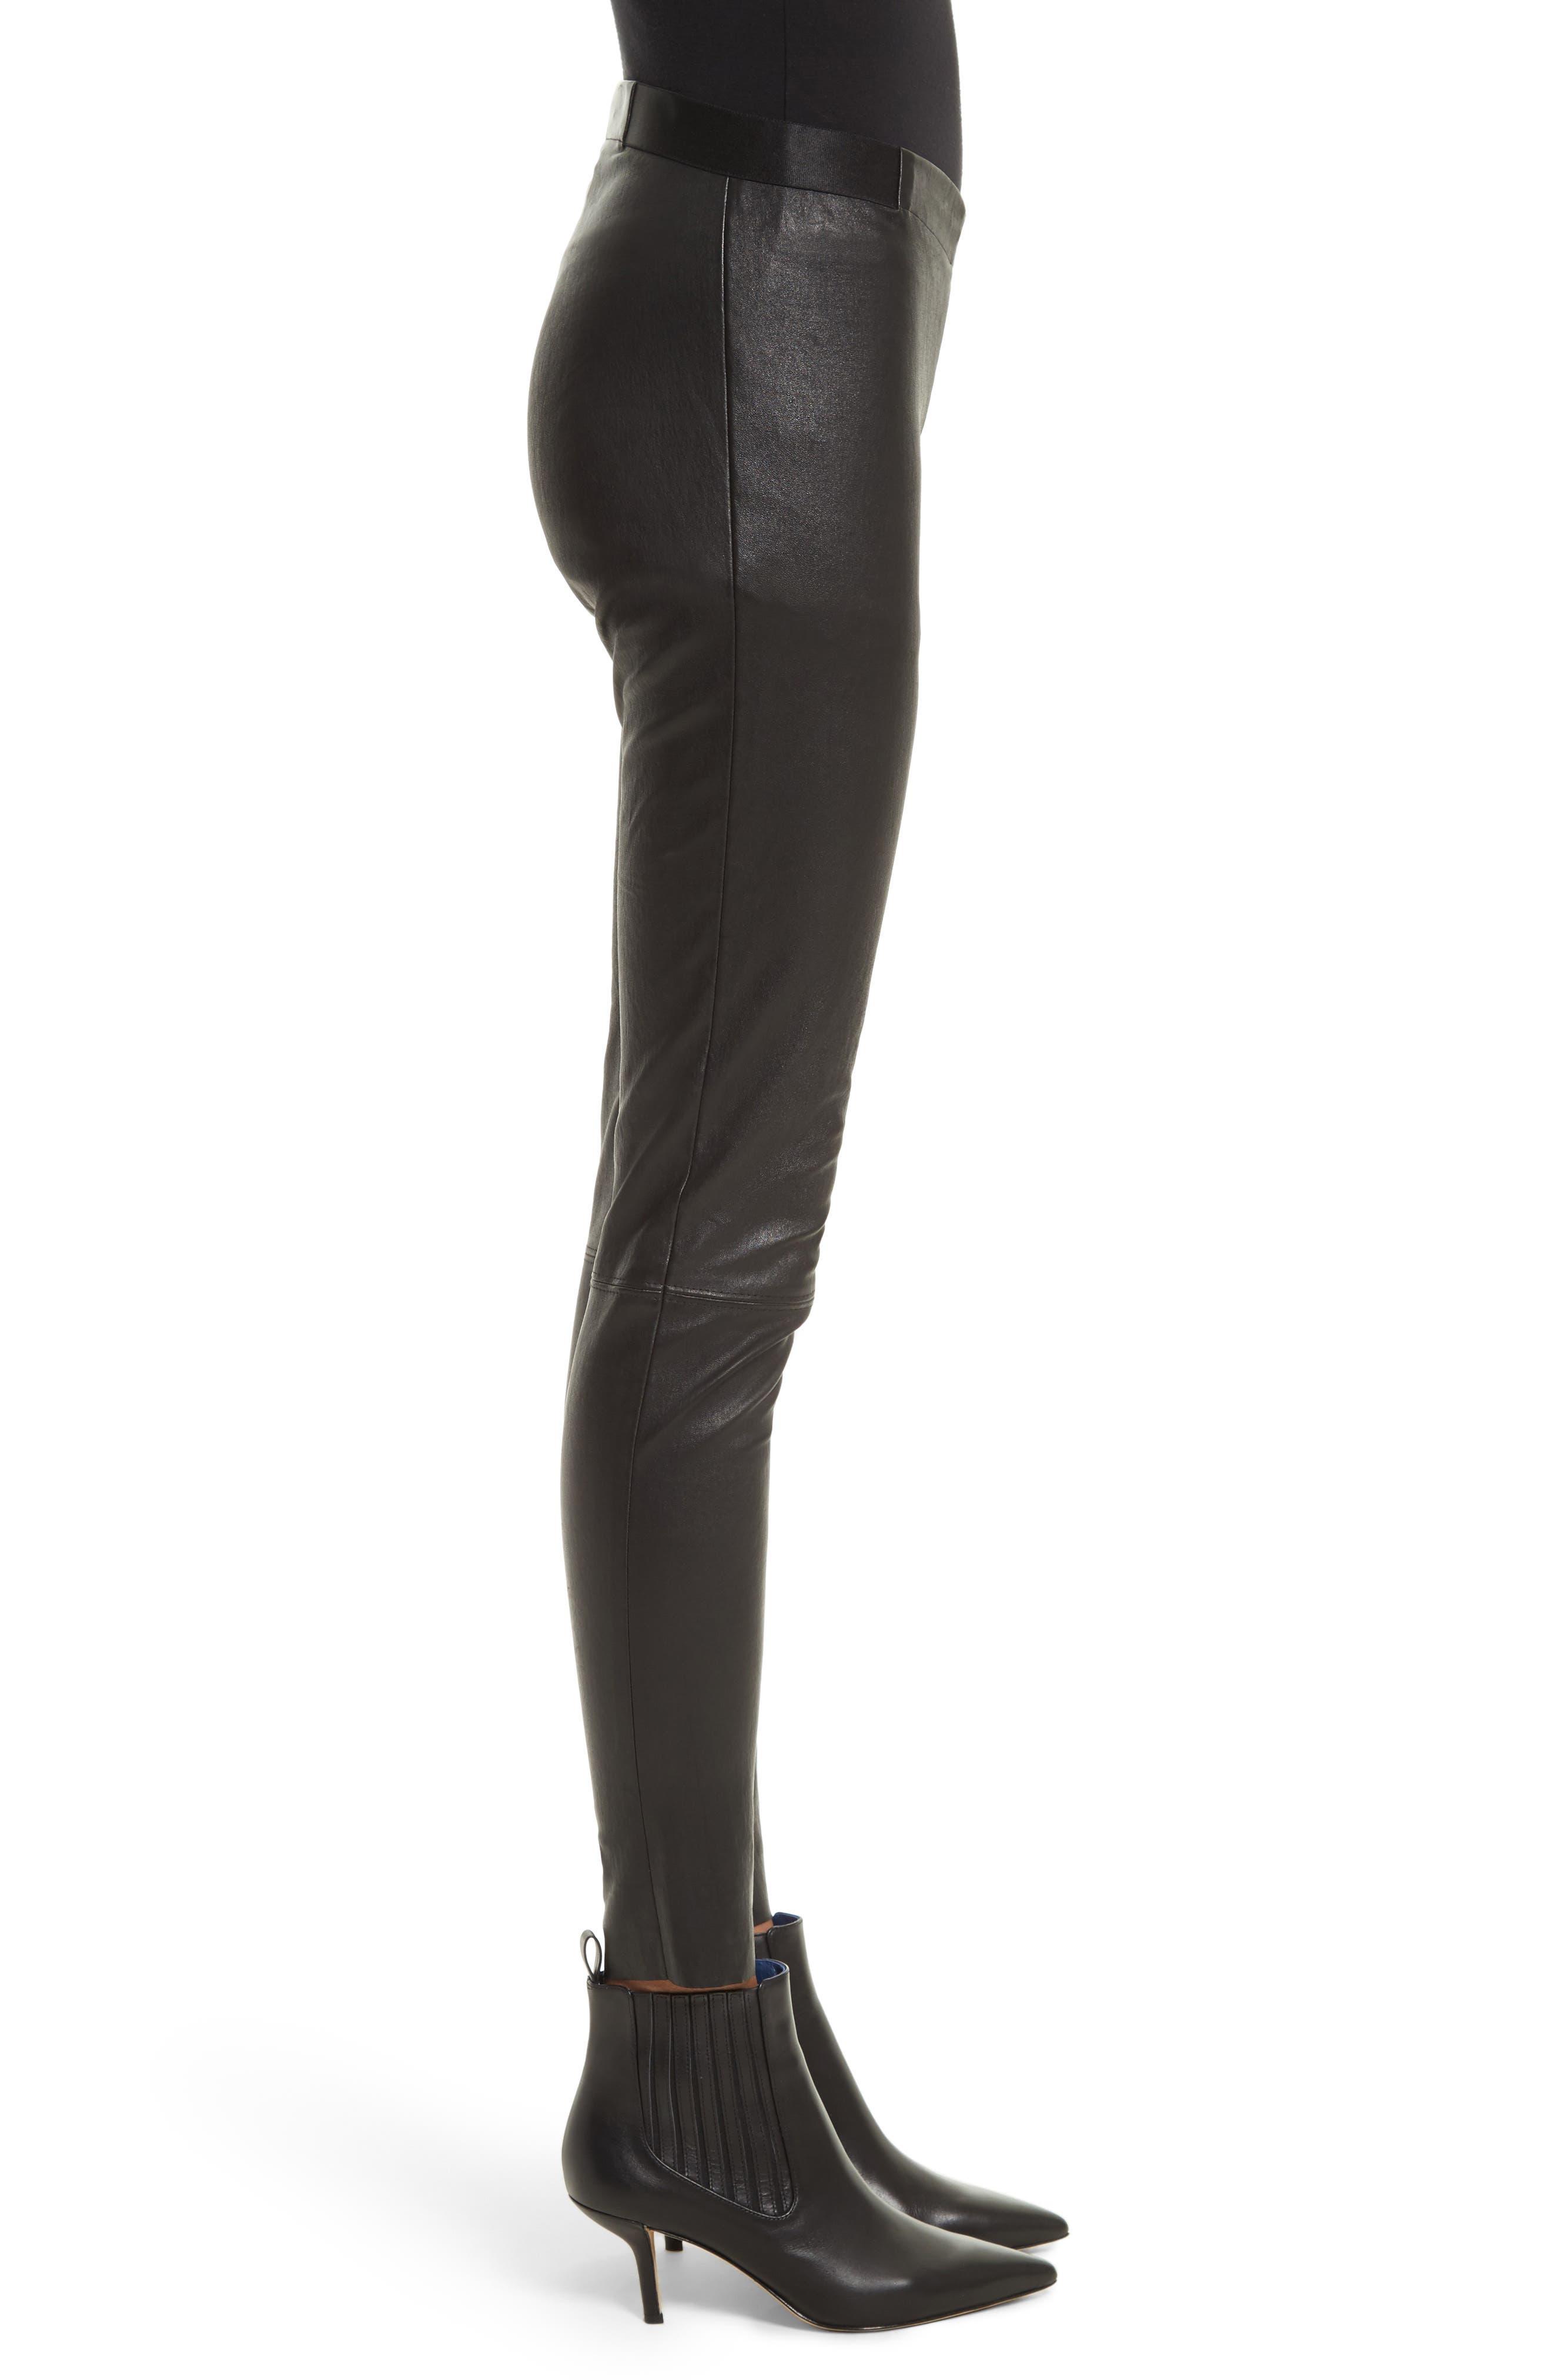 ALICE + OLIVIA, Leather Leggings, Alternate thumbnail 4, color, BLACK